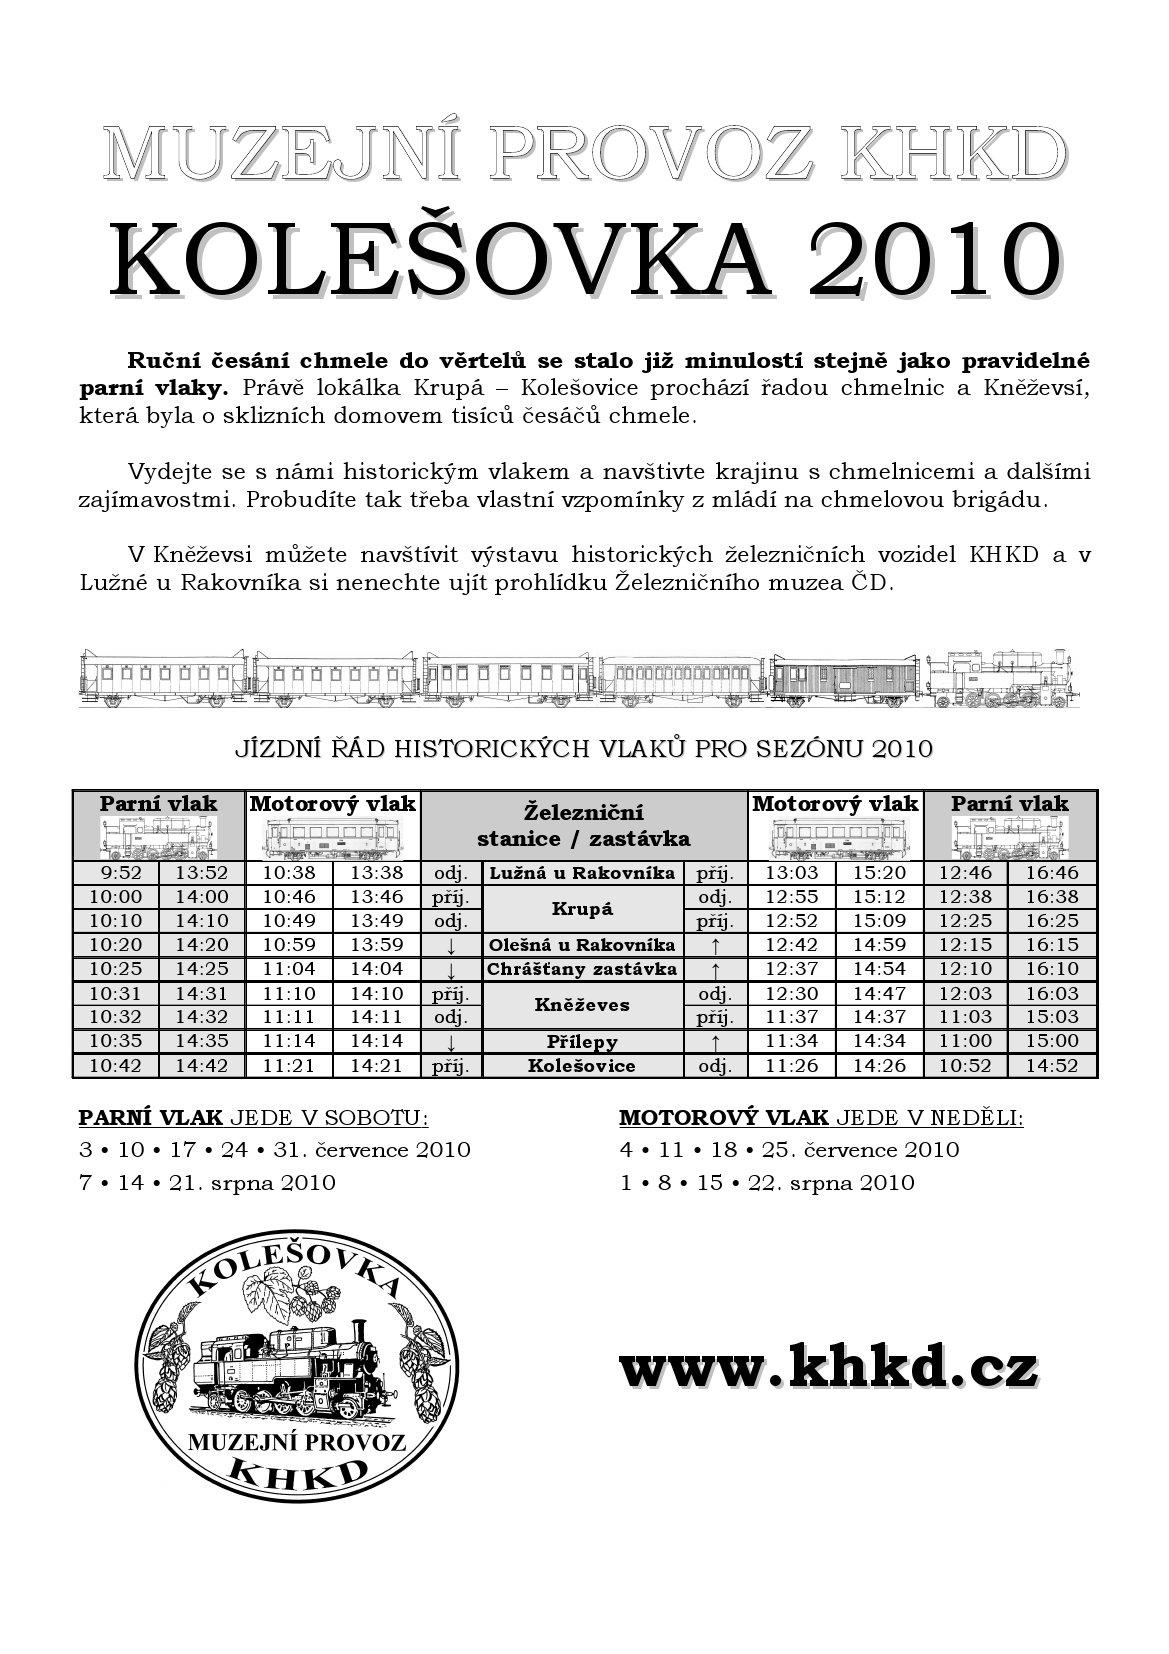 Kolesovka_2010_plakat_A3